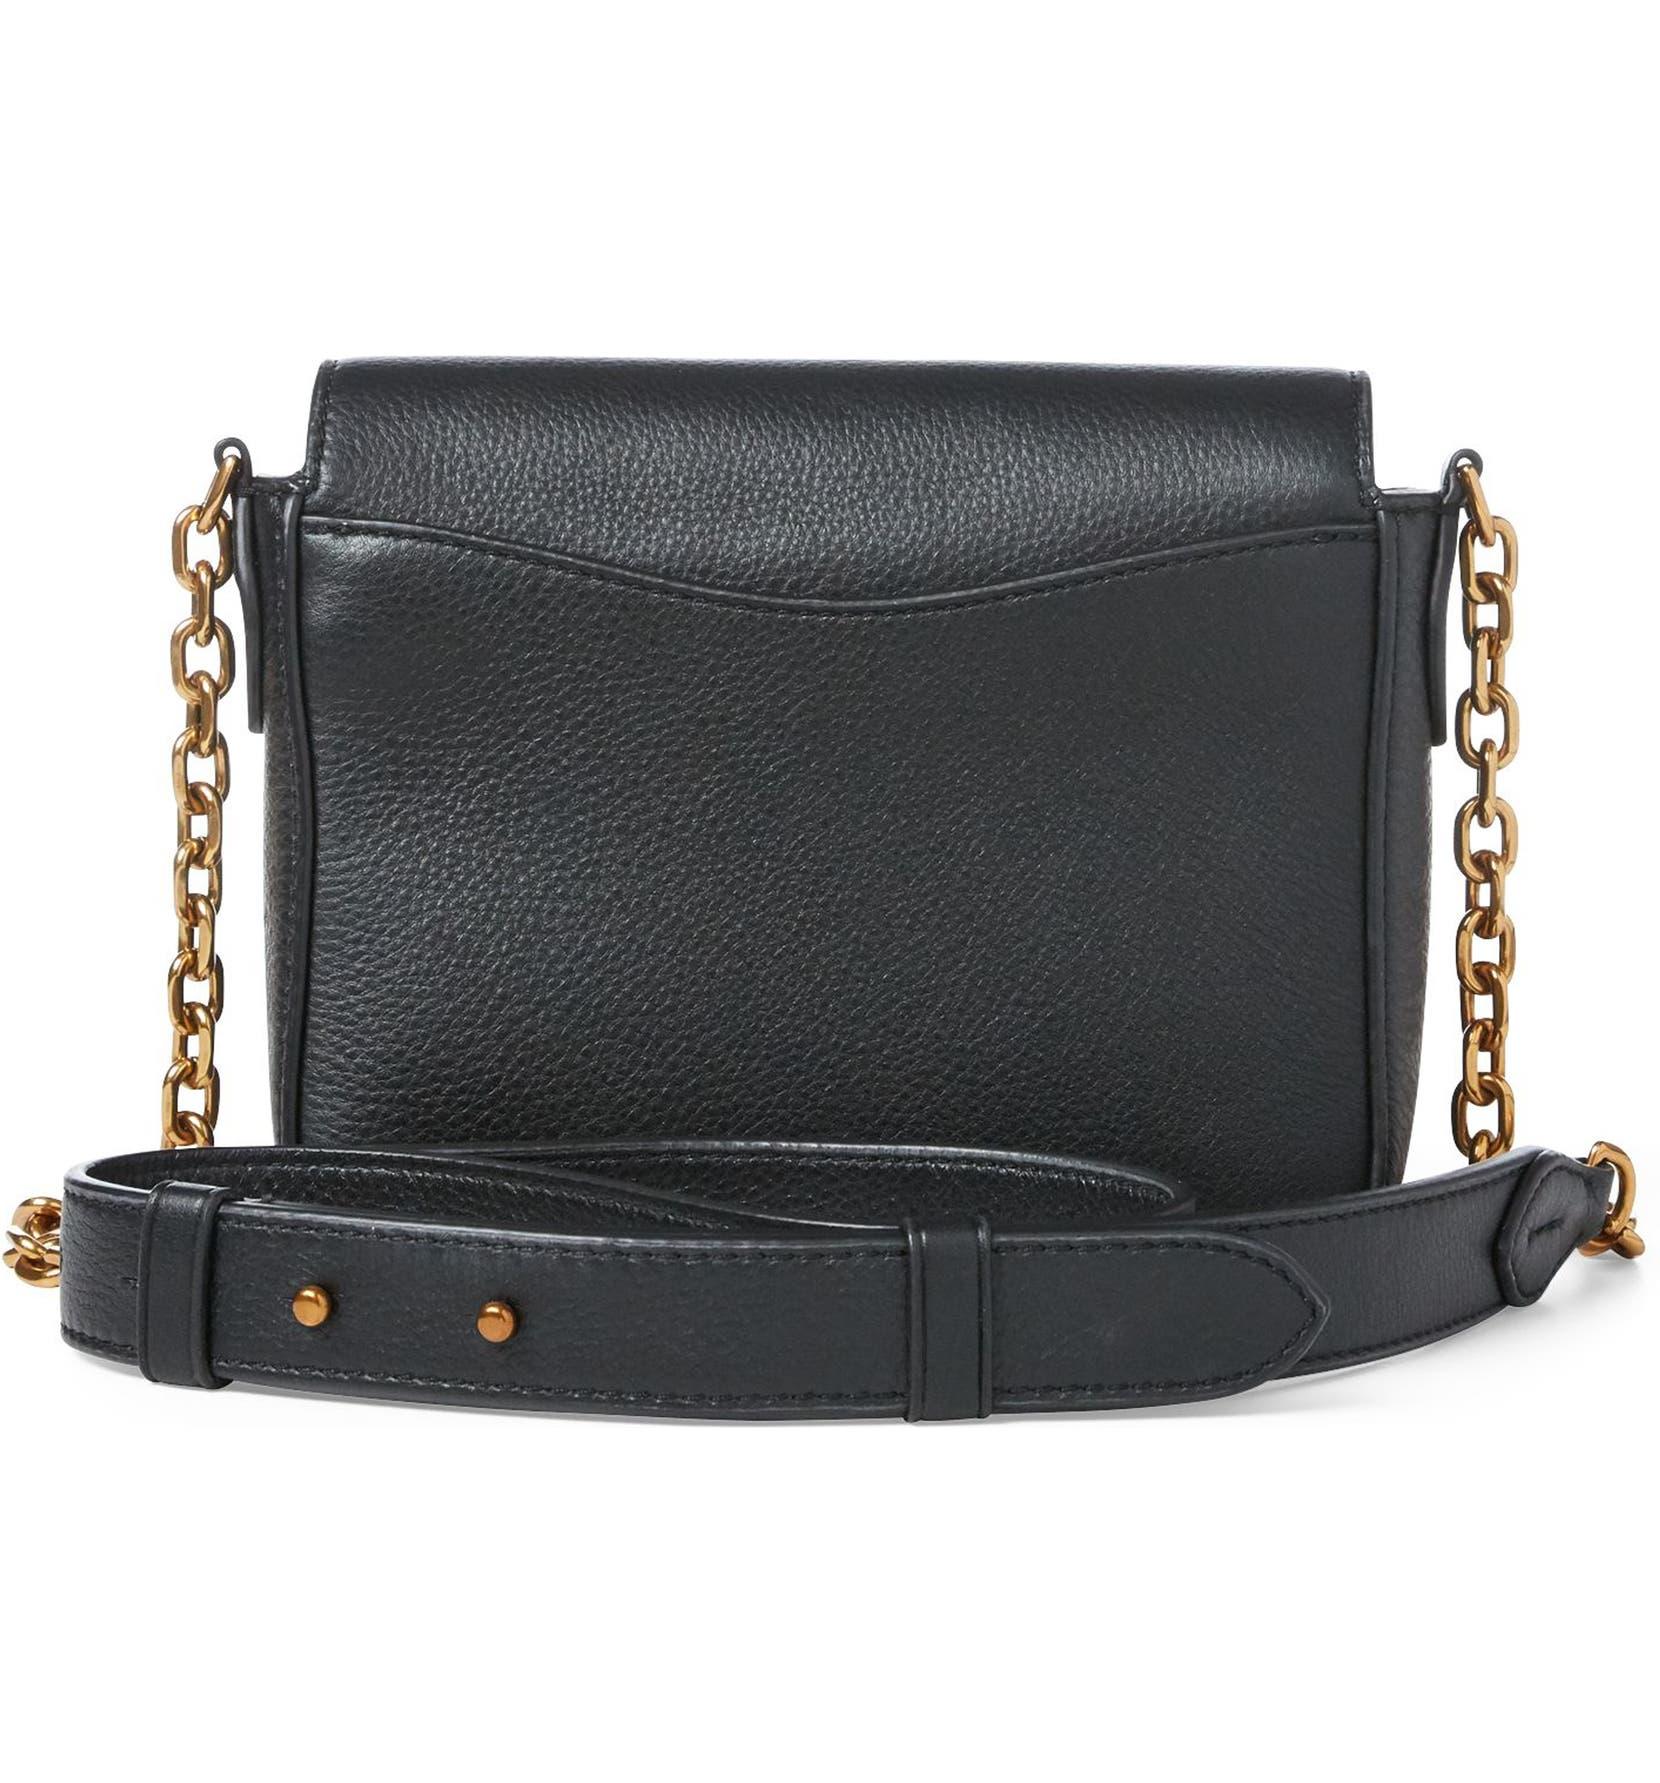 b2115fd62a3 Polo Ralph Lauren Brooke Leather Crossbody Bag | Nordstrom